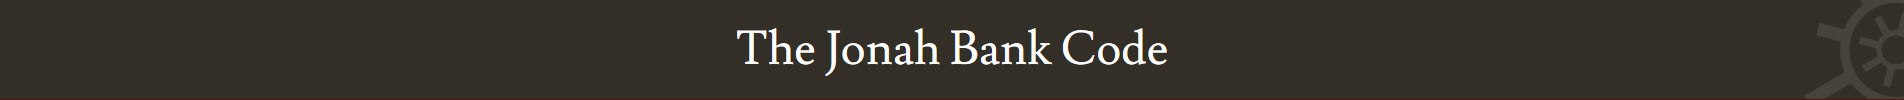 The Joah Bak Code